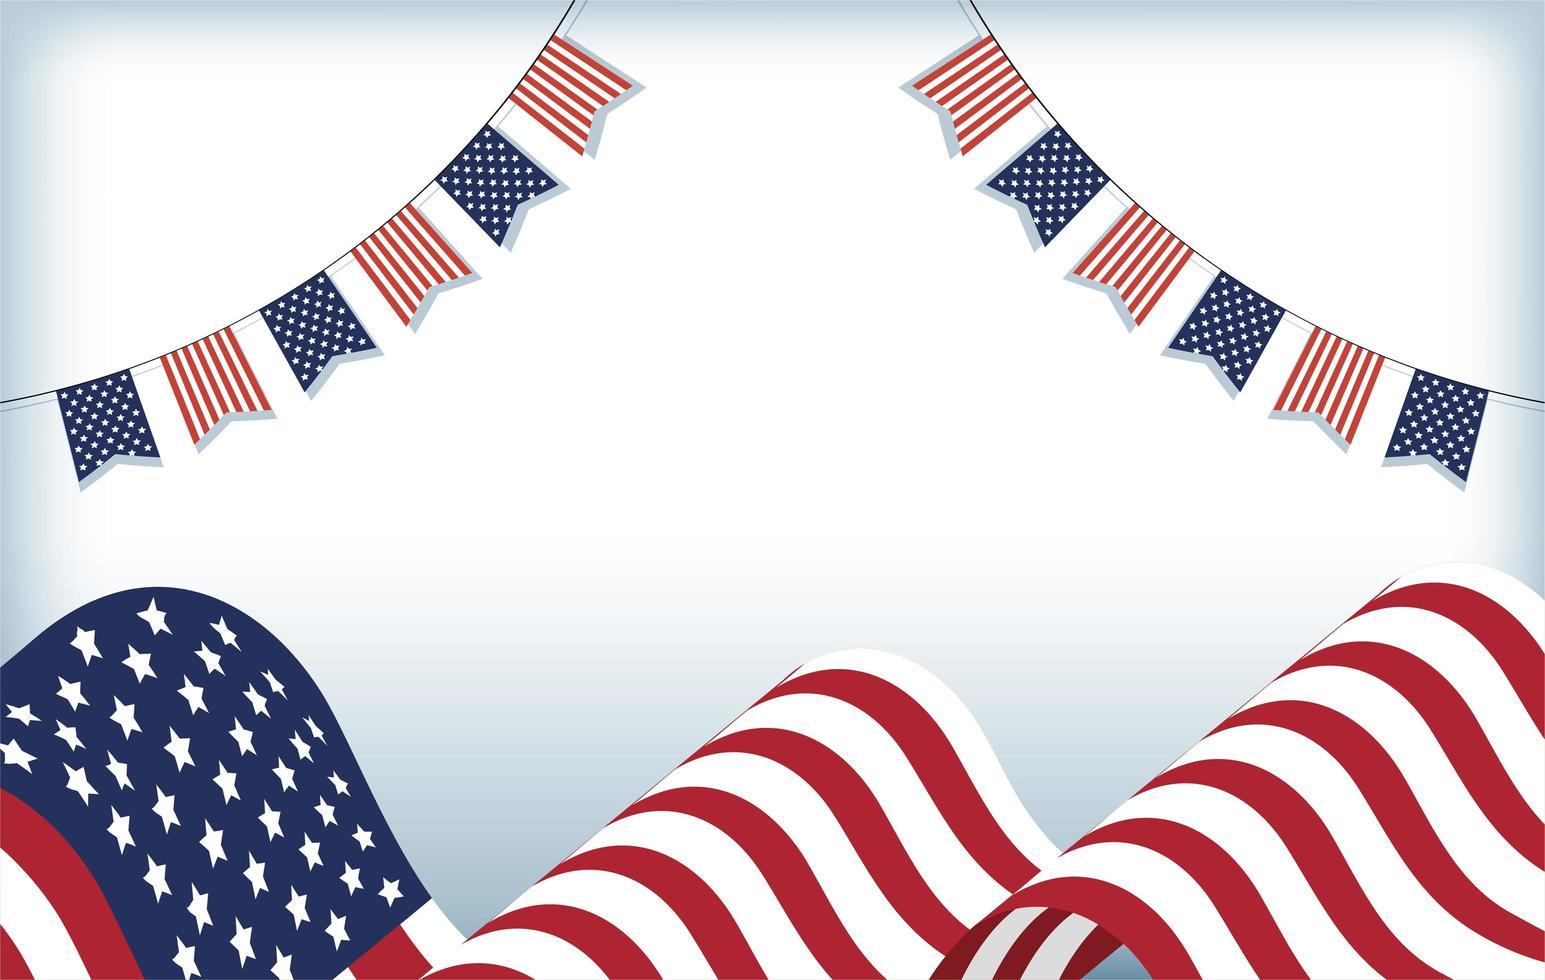 USA Flagge und Banner Wimpel Vektor Design